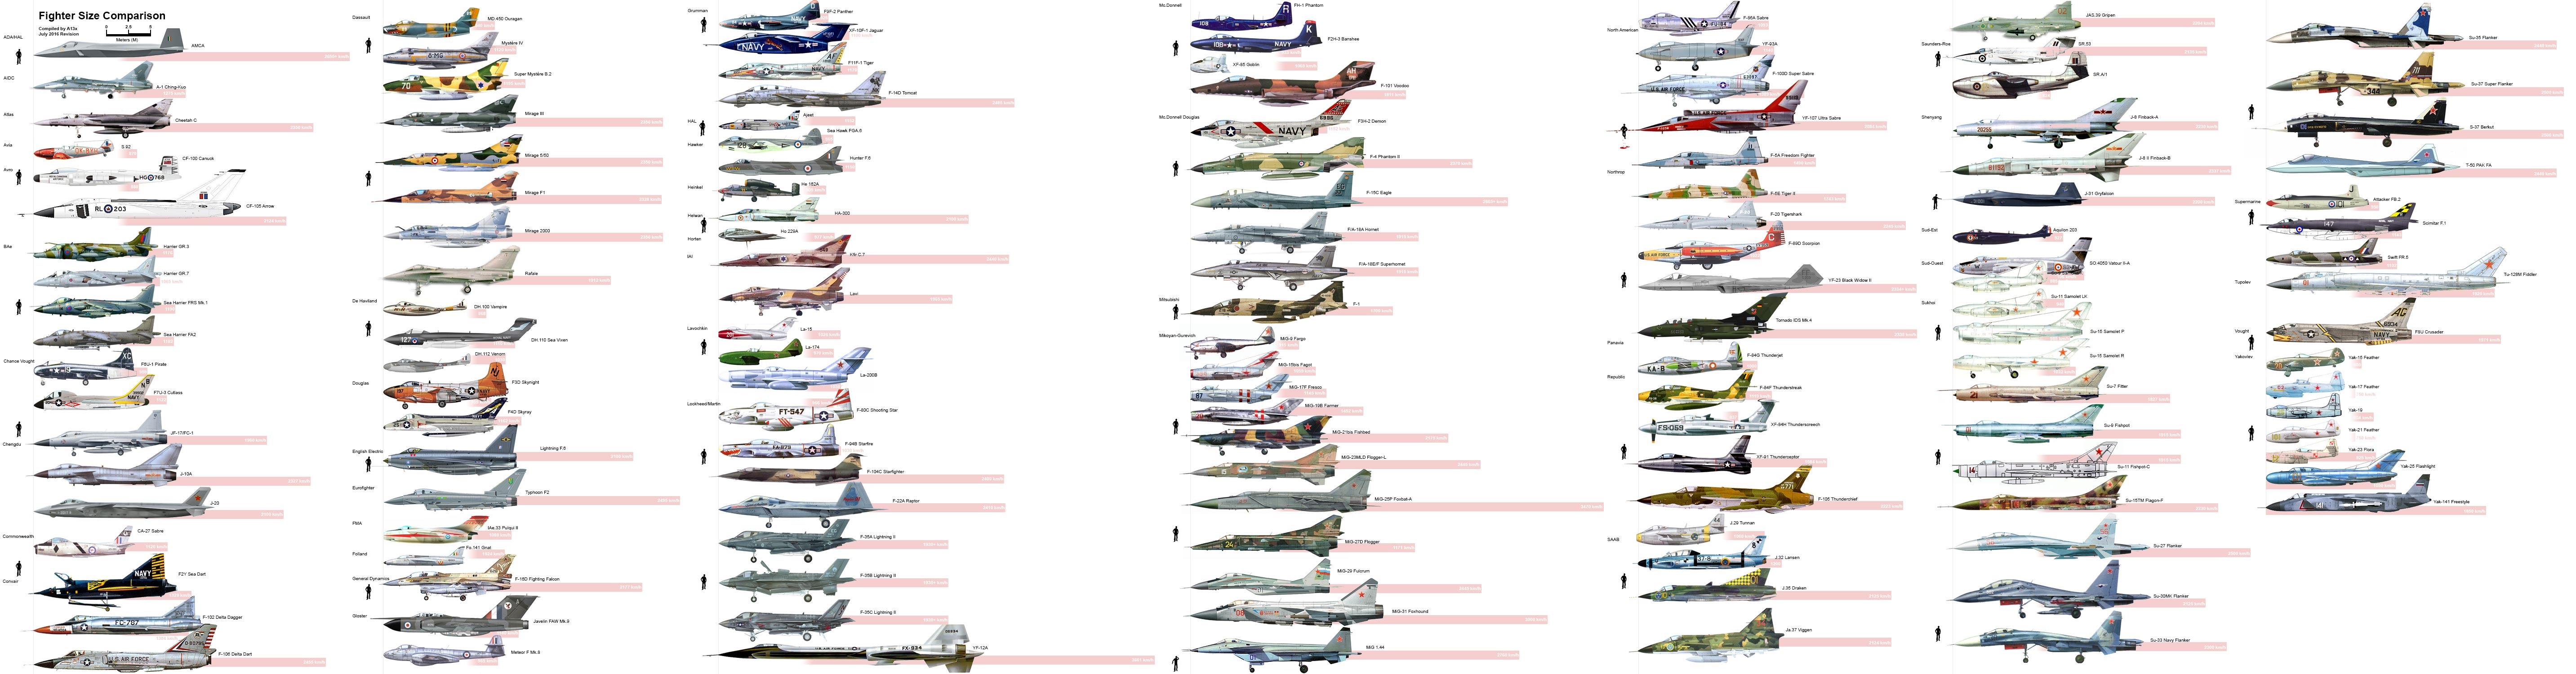 FighterCompJuly16.jpg